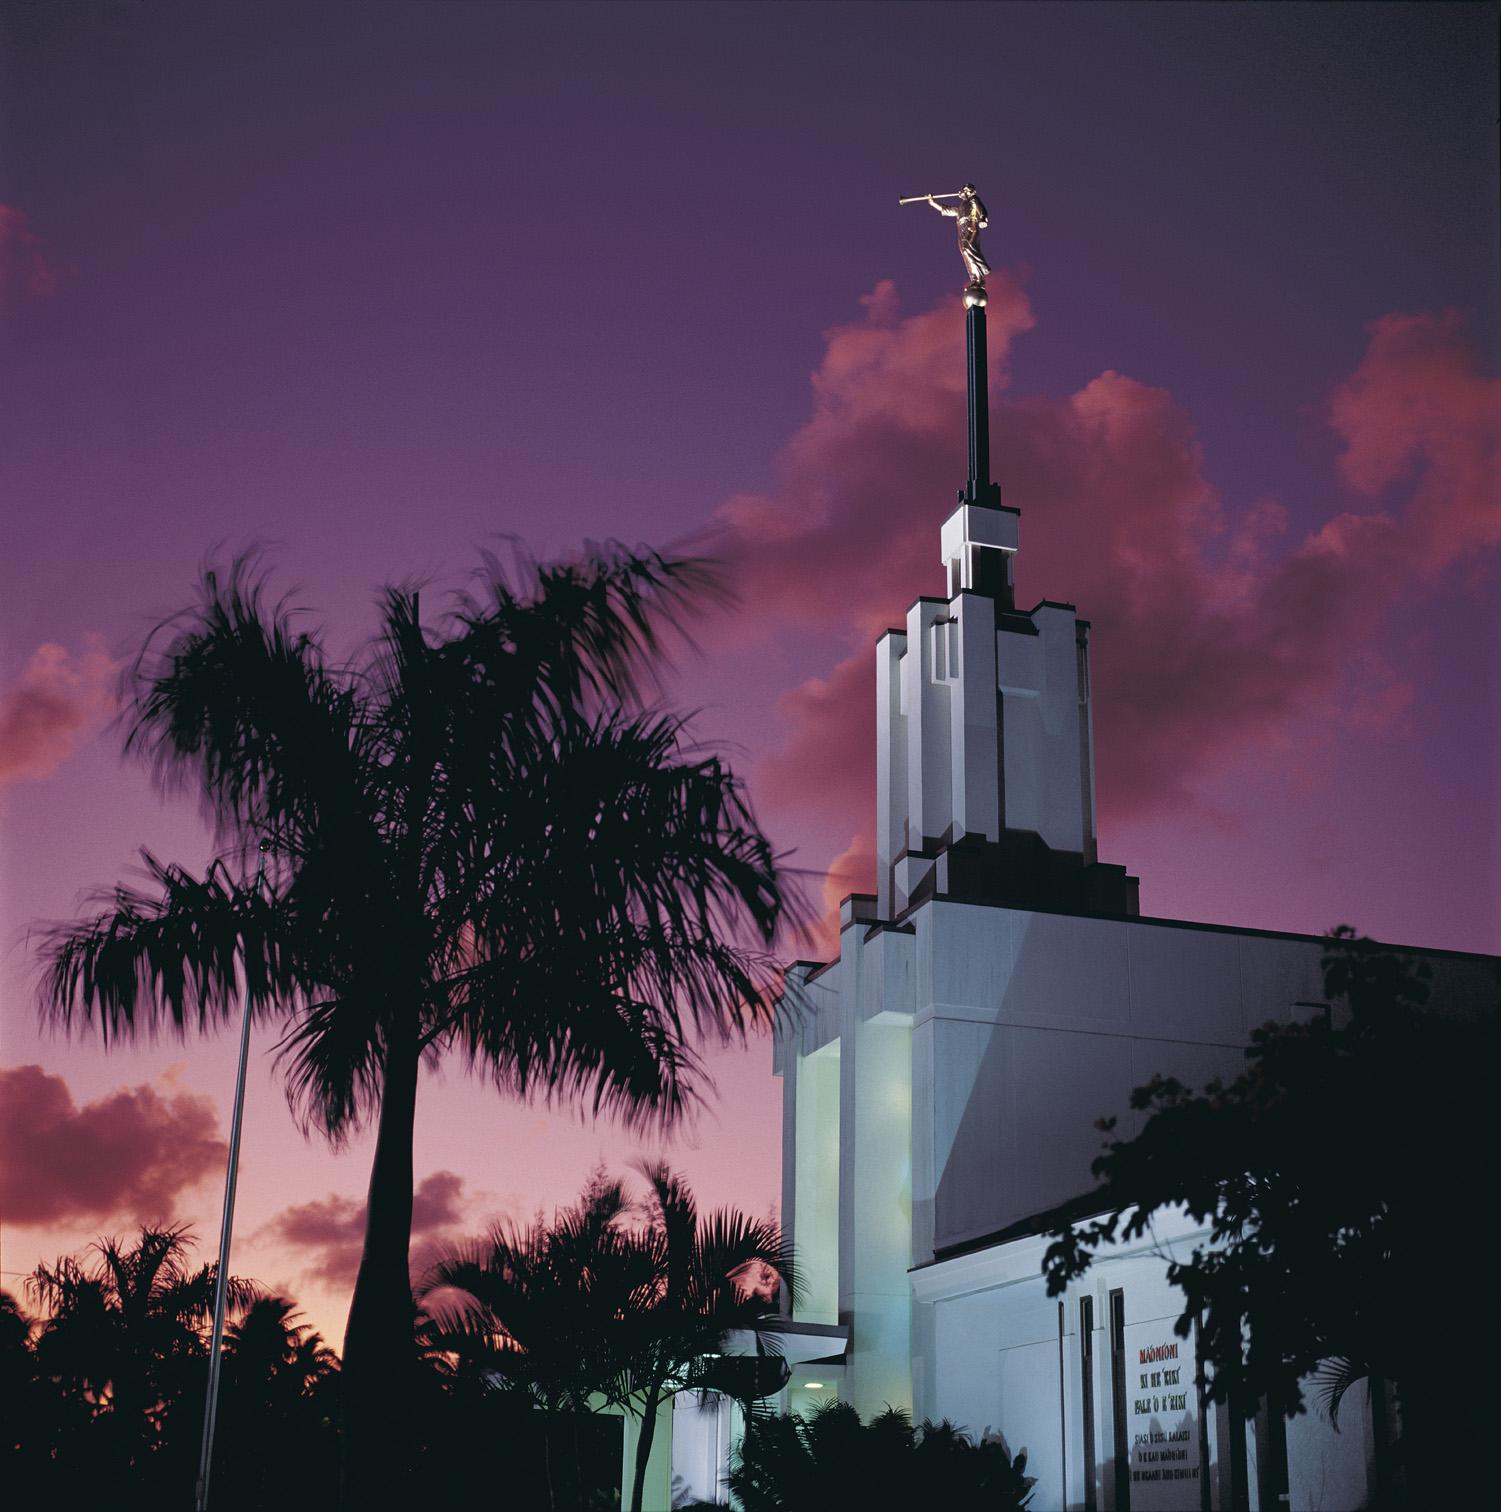 The Nuku'alofa Tonga Temple at sunset.